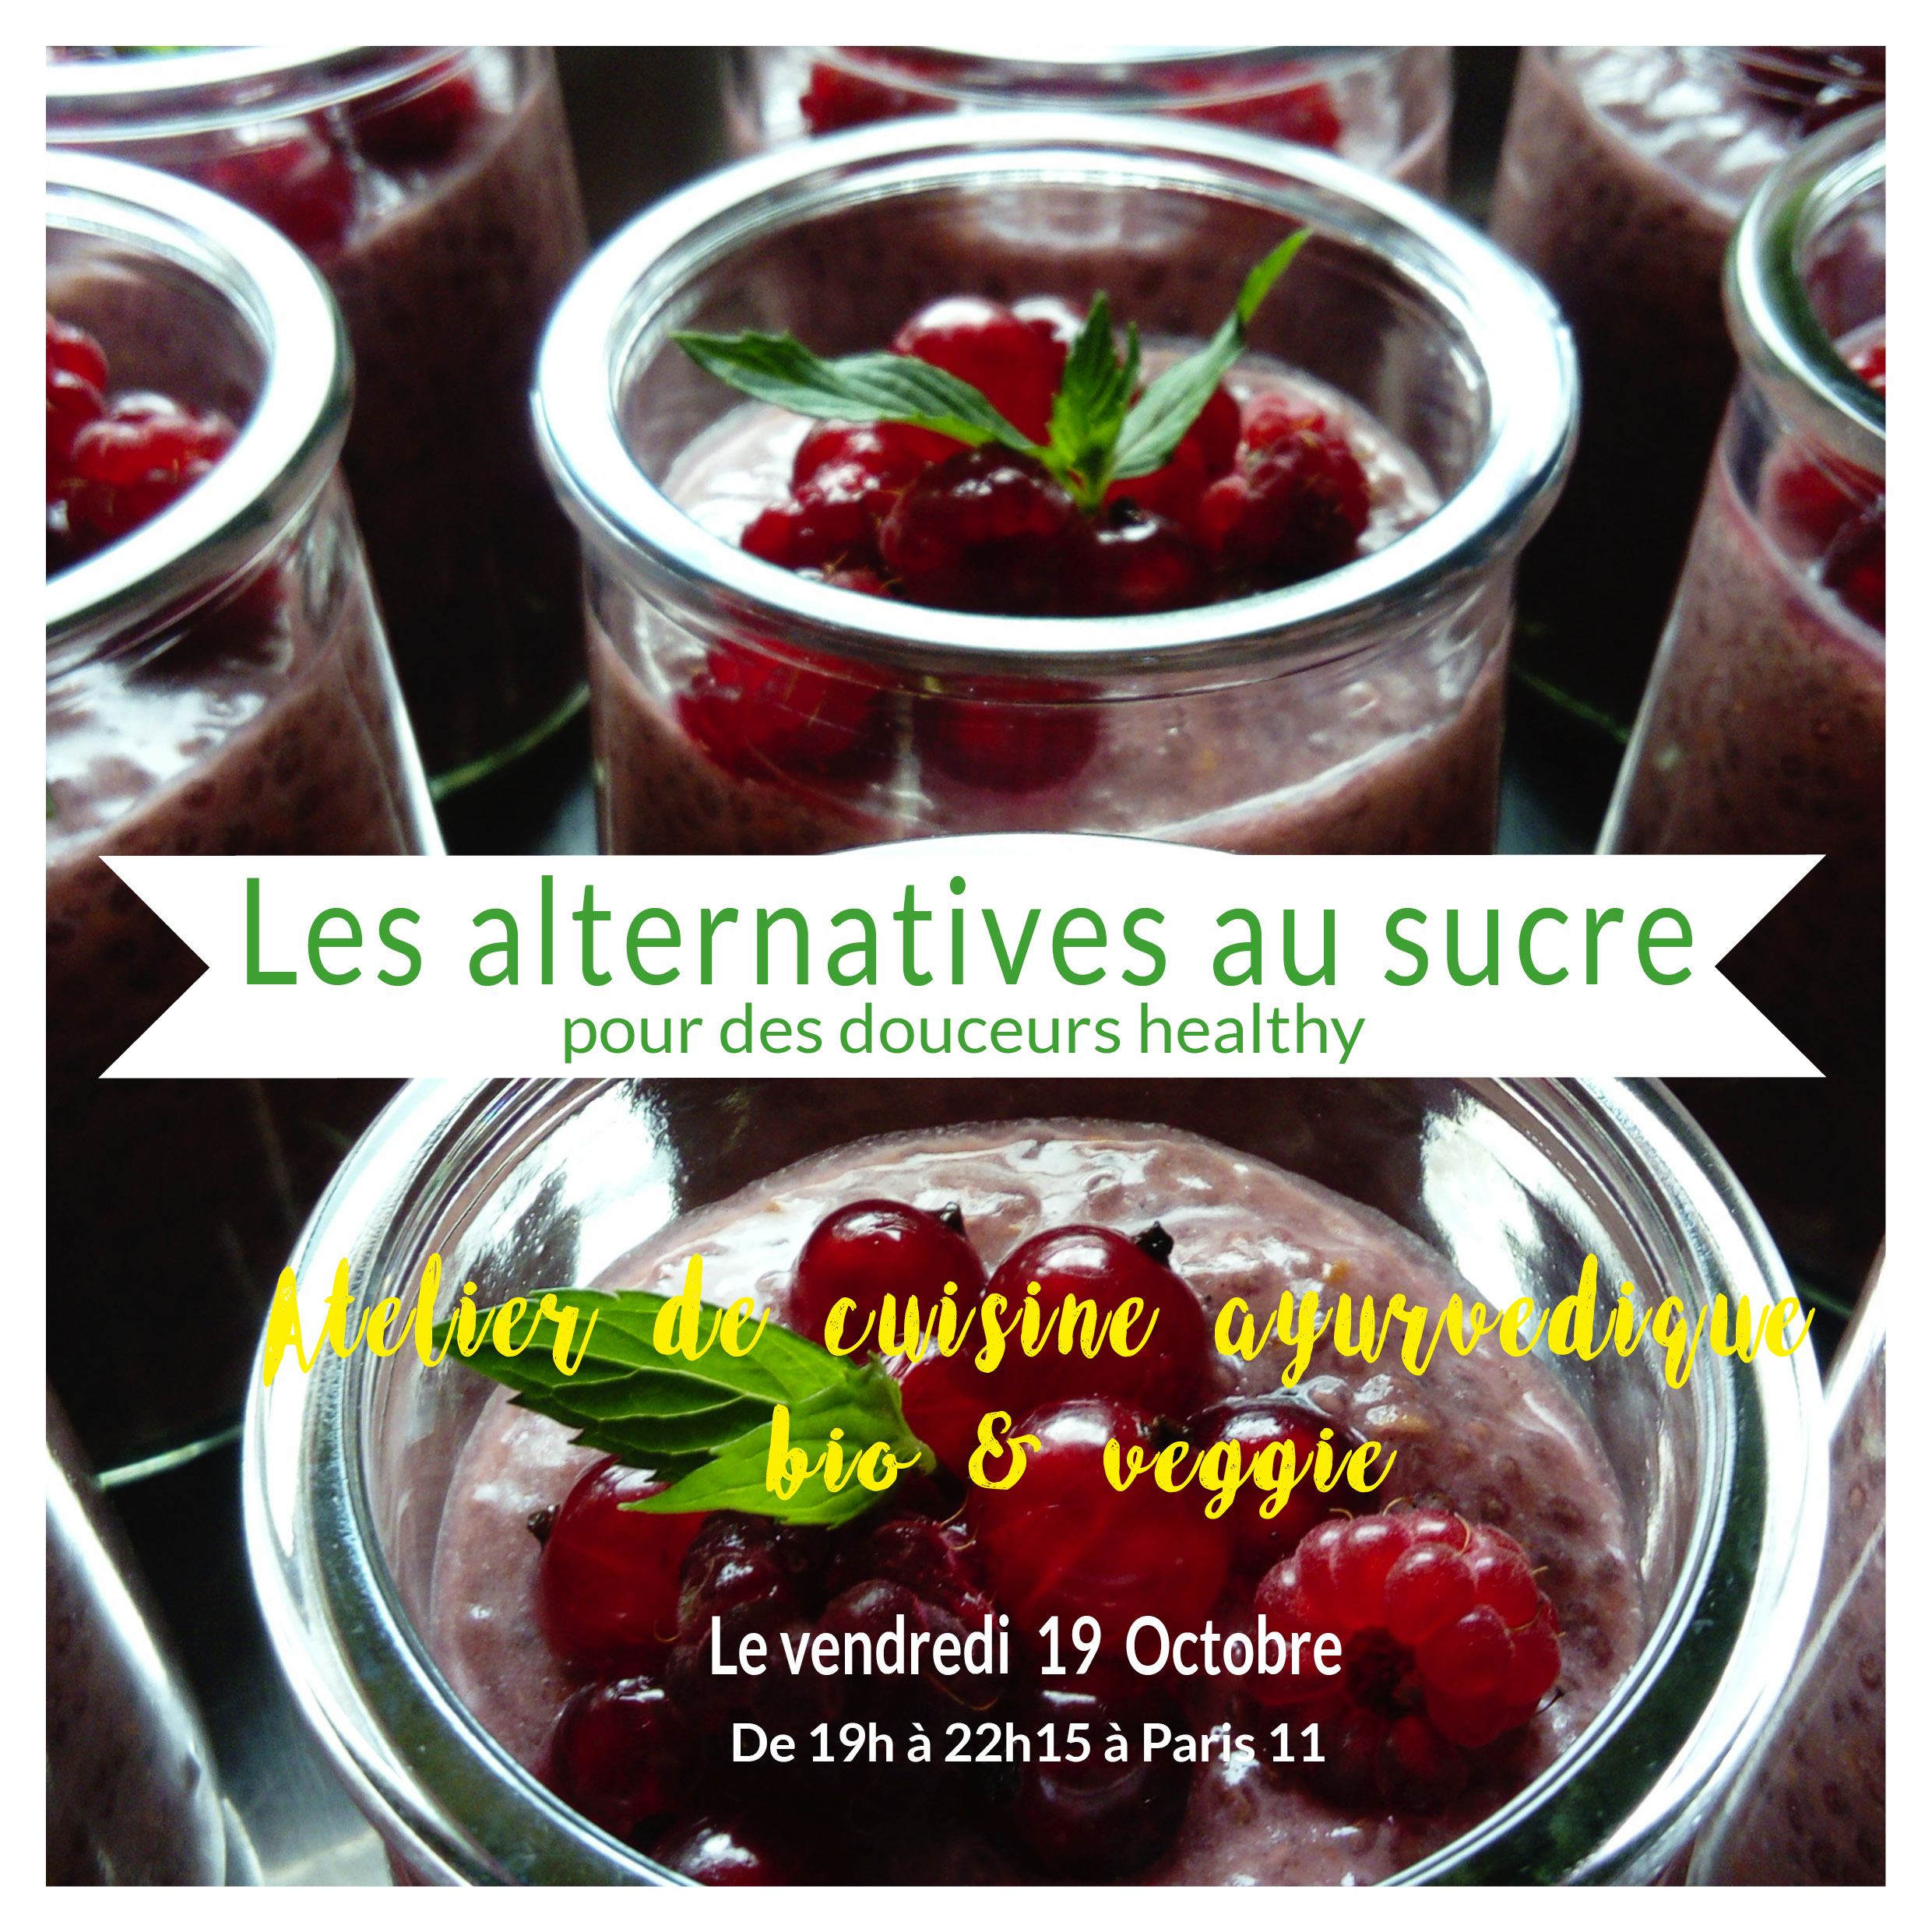 atelier-cuisine-vegan-ayurvedique-vegetarienne-sans-sucre-paris-11.jpg